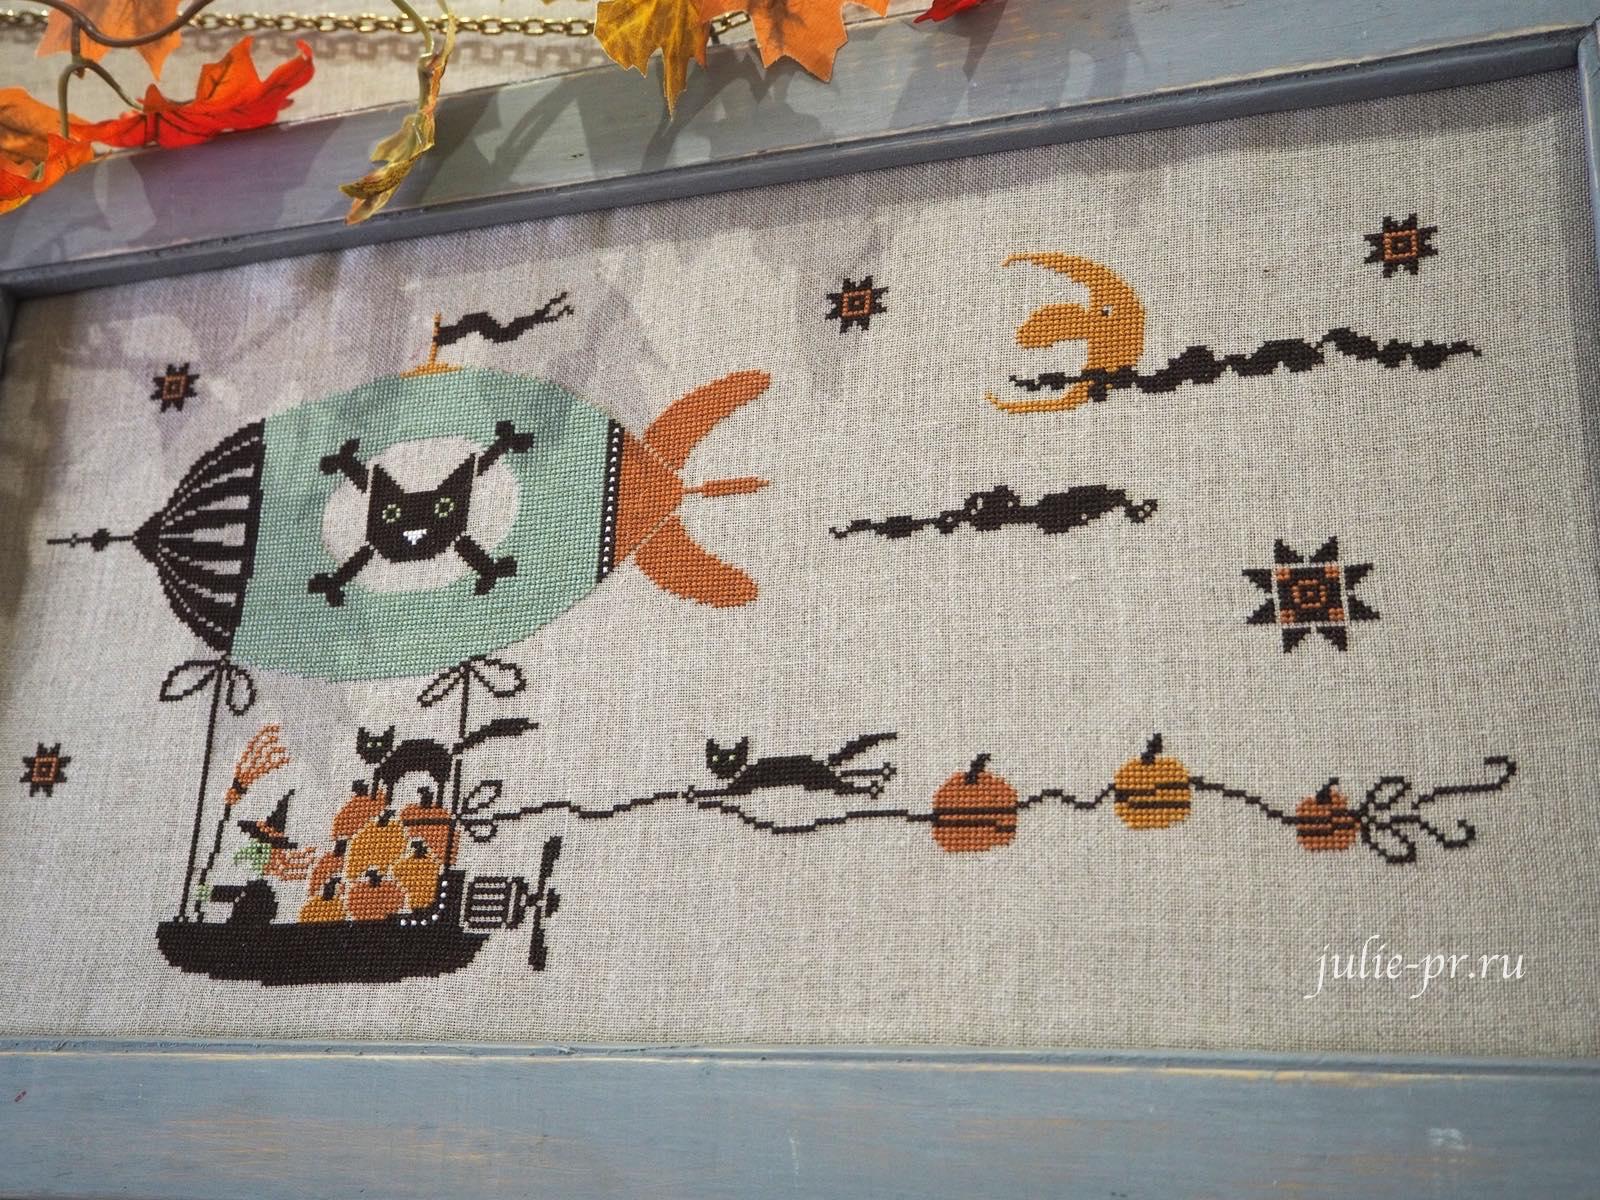 Madame Chantilly, Pumpkins thieves, Воришки тыкв, вышивка крестом